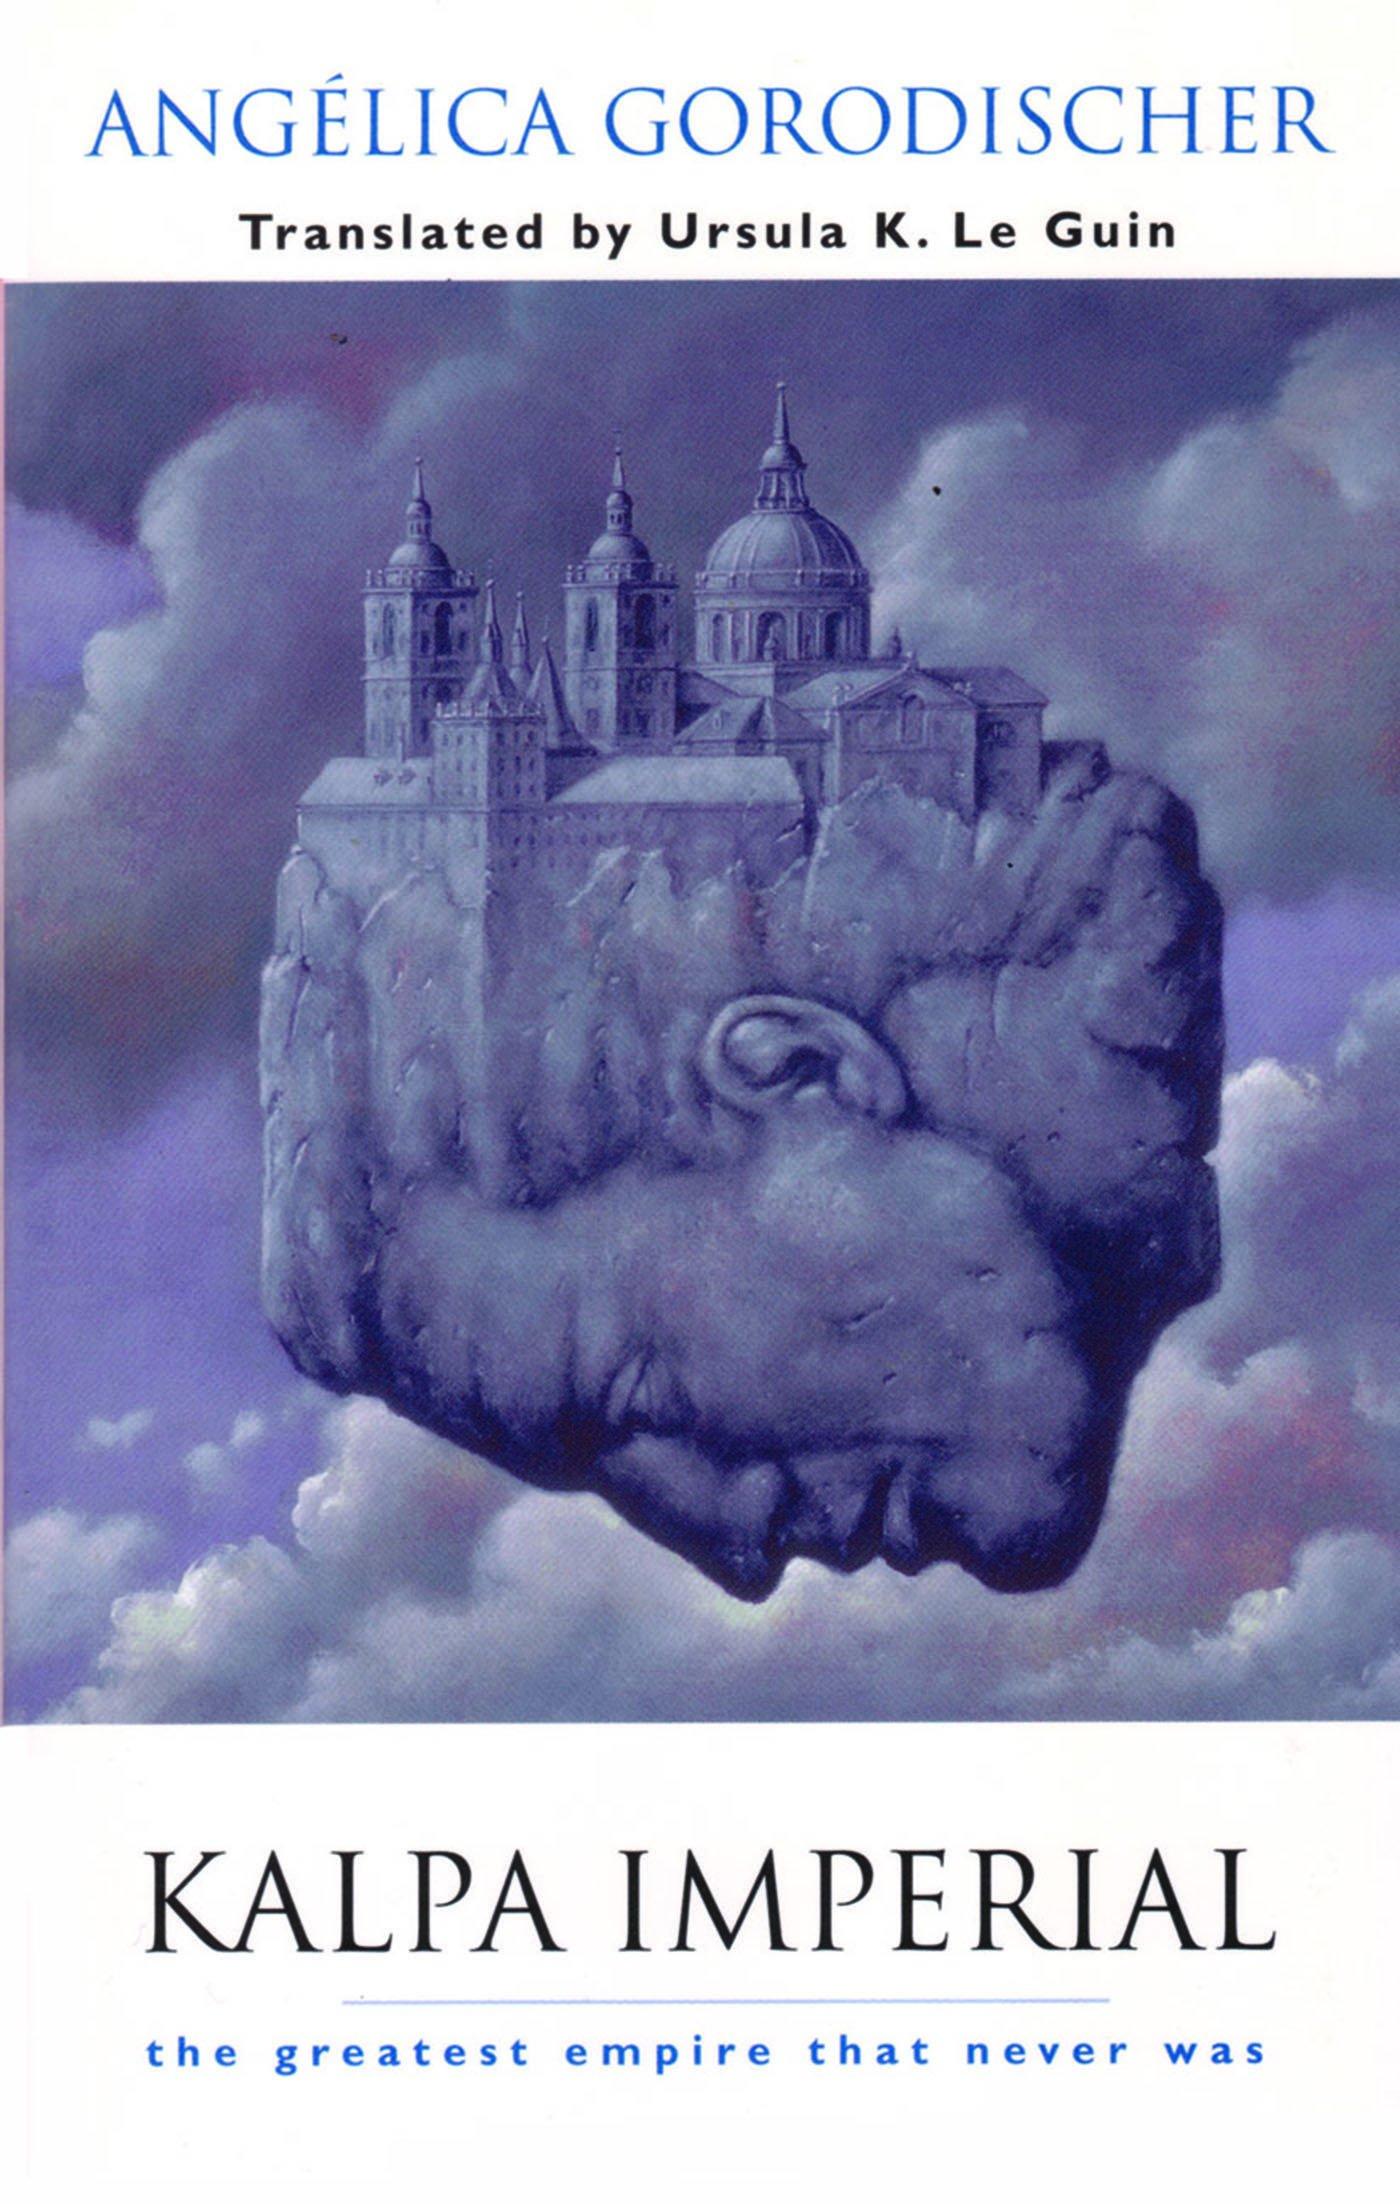 Jisu: Kalpa Imperial - by Angélica Gorodischer, translated by Ursula K. Le Guin (Small Beer Press)